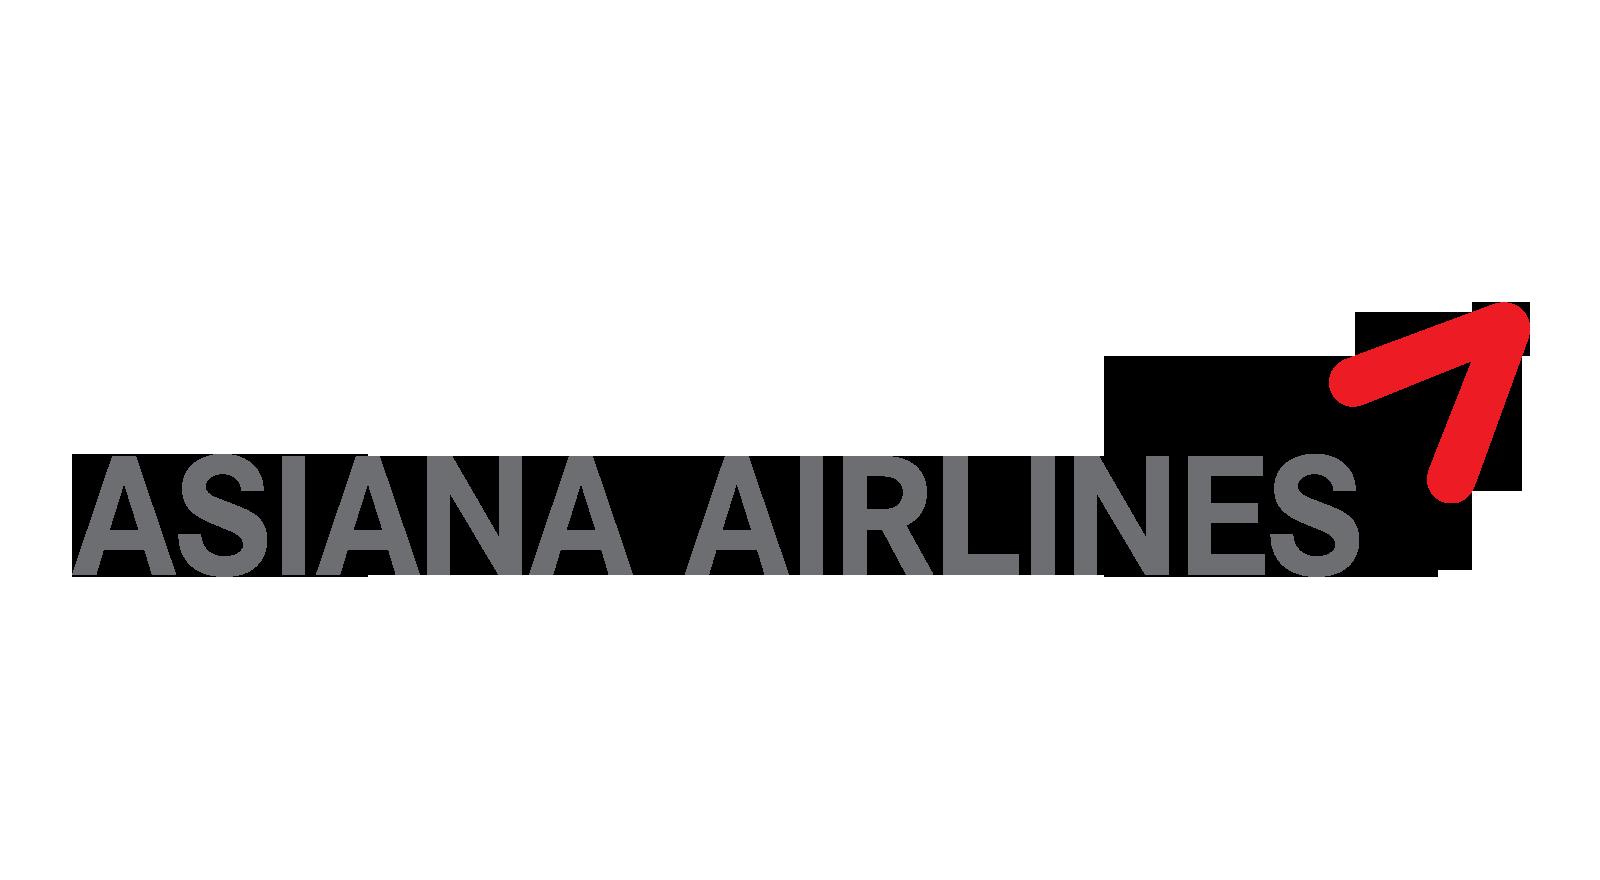 Télephone information entreprise  Asiana Airlines